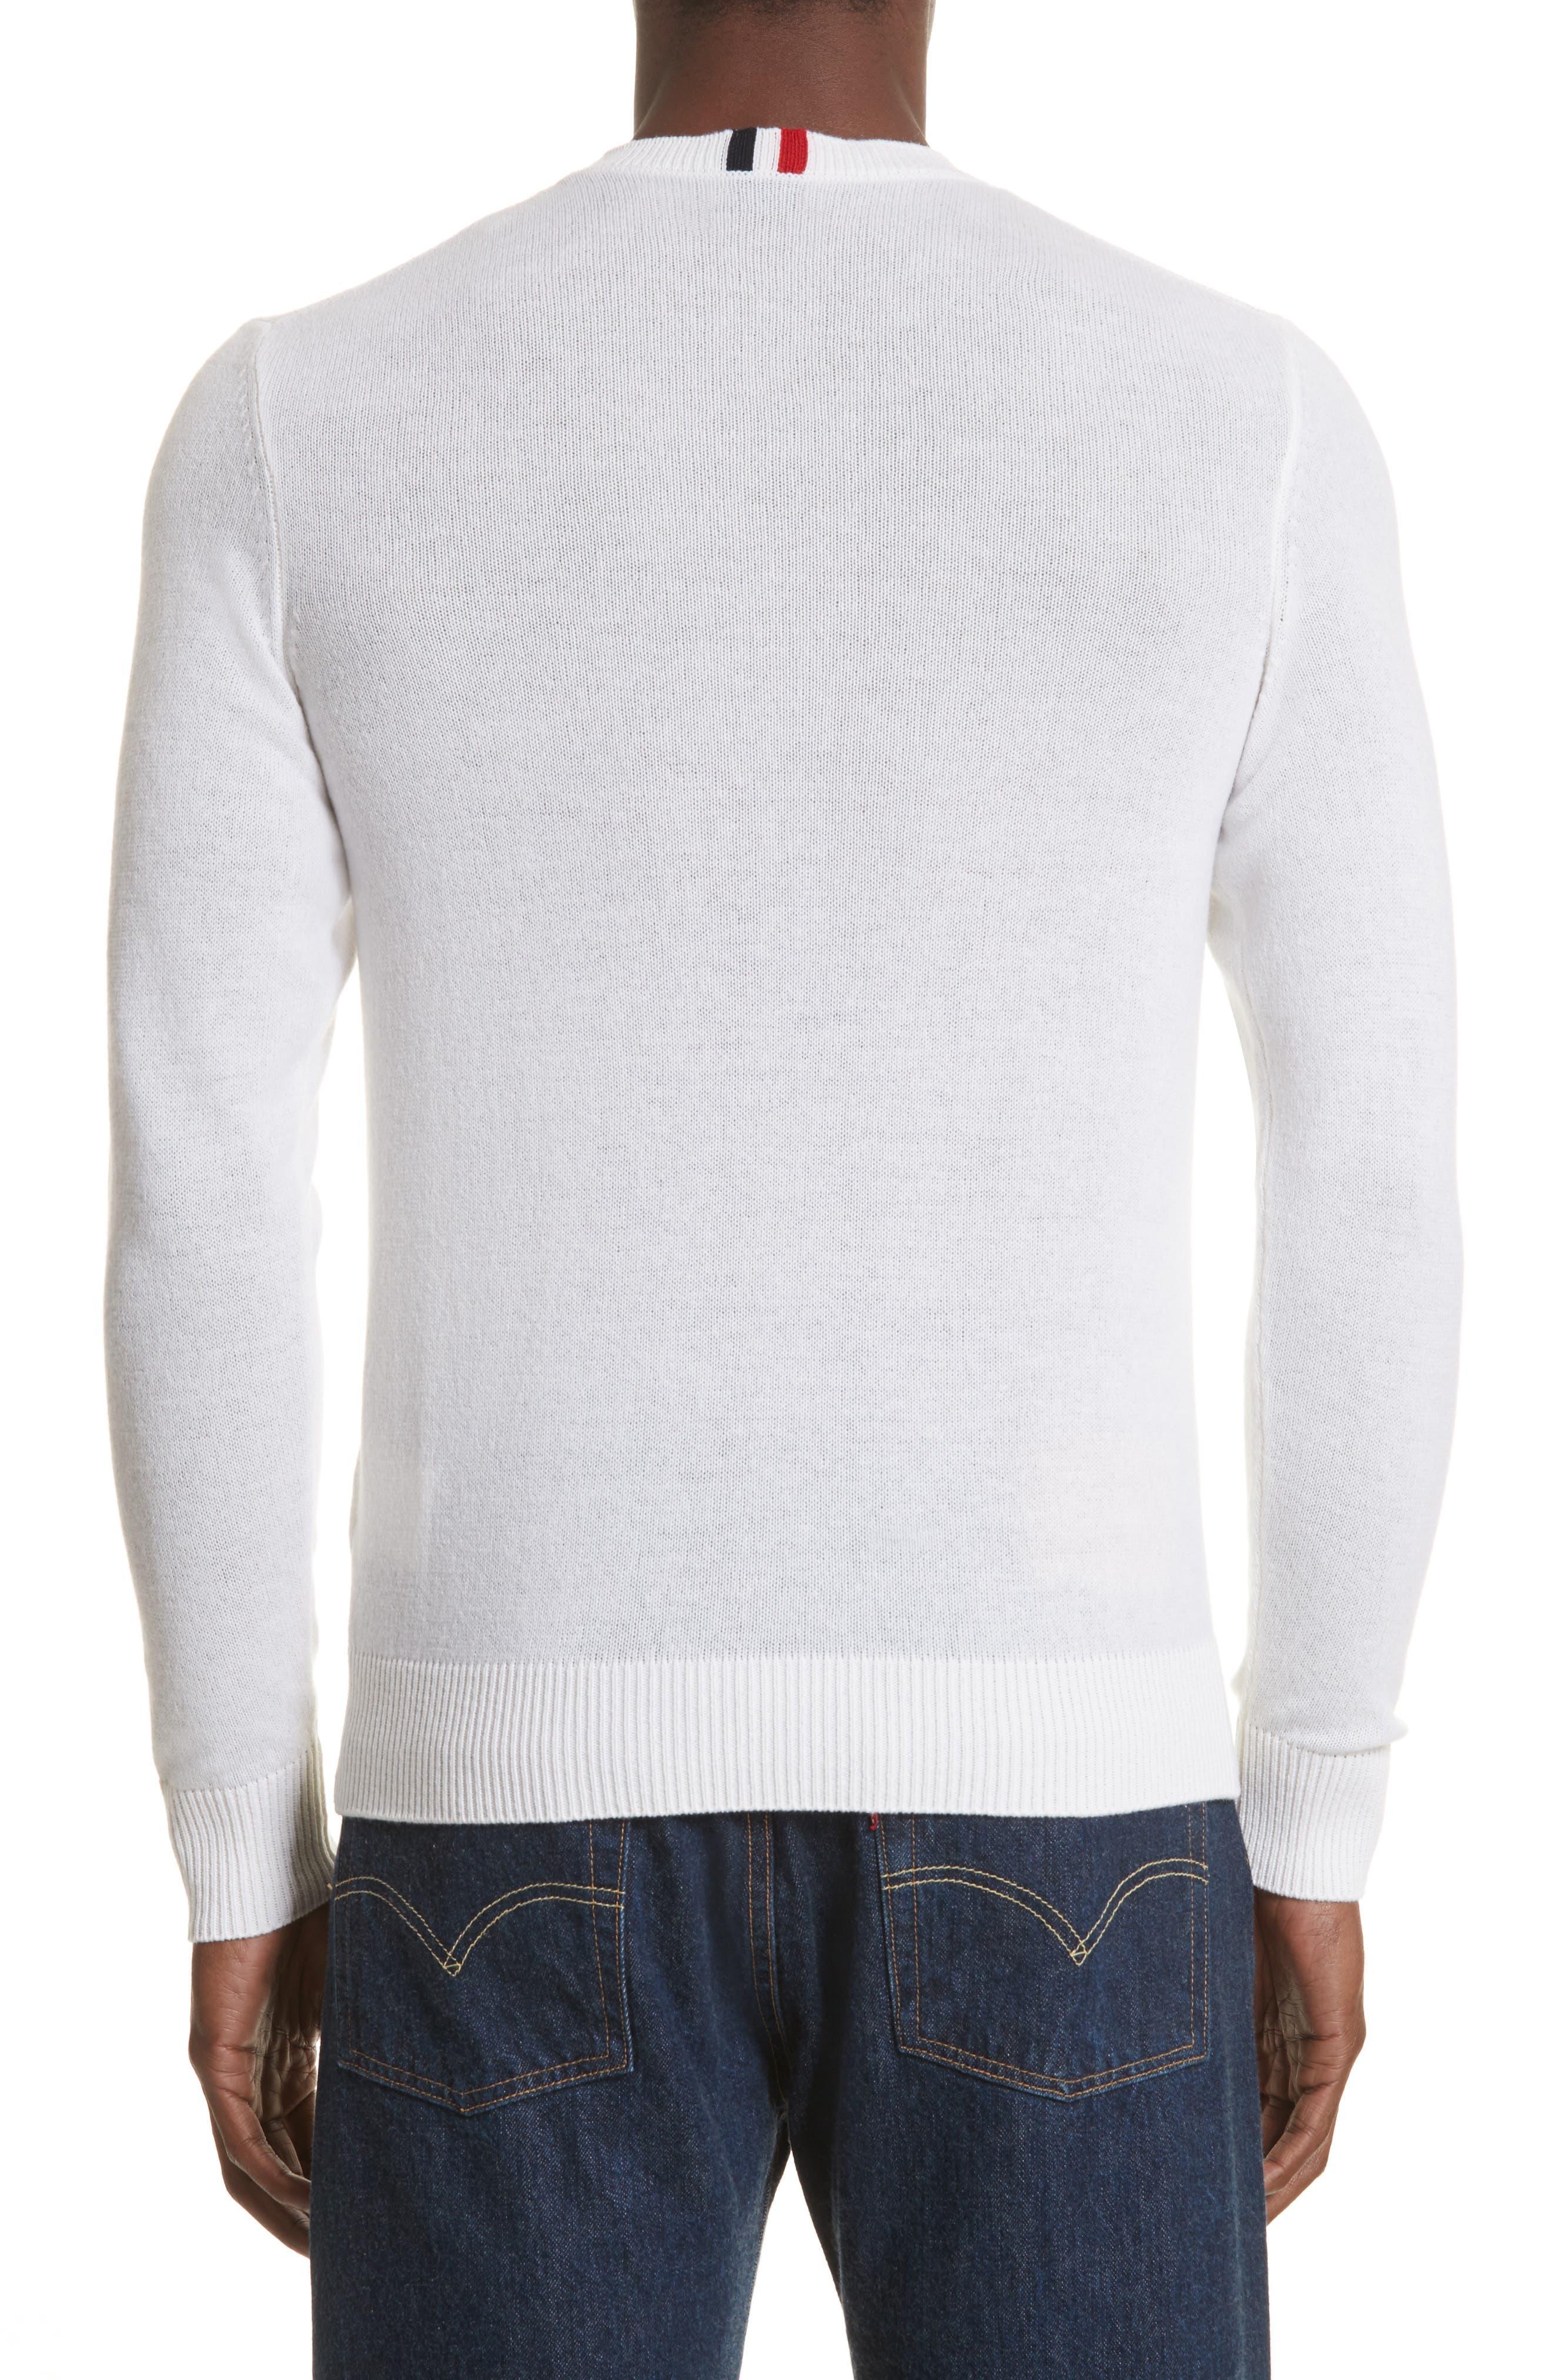 Cashmere Crewneck Sweater,                             Alternate thumbnail 2, color,                             White